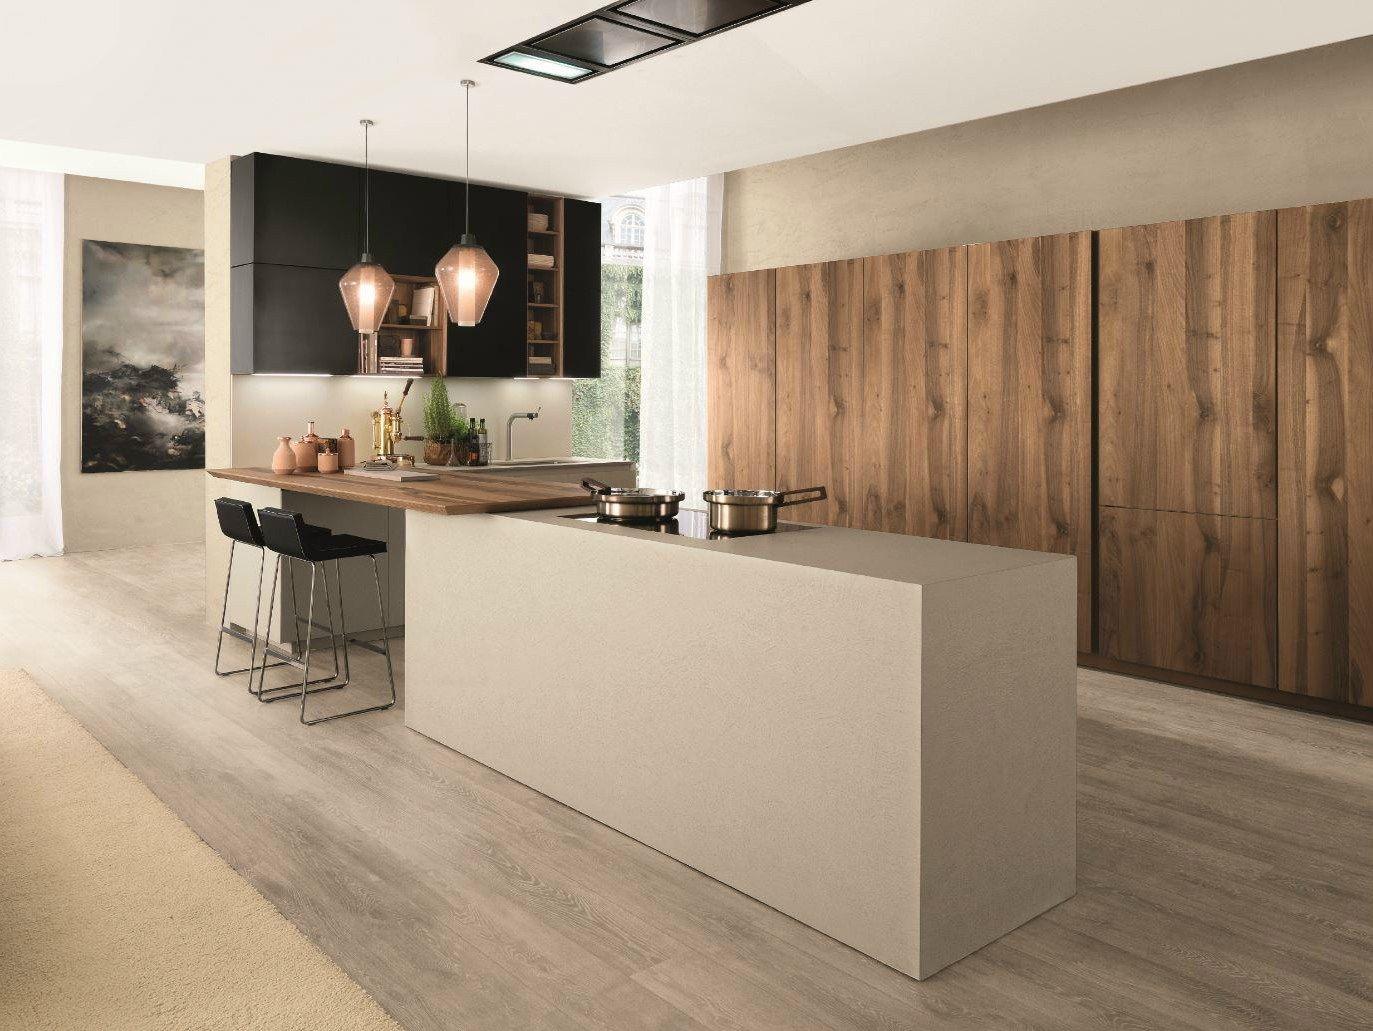 Fitted Kitchen With Island Filoantis By Euromobil Design Roberto Gobbo 現代的なキッチン キッチンデザイン 素朴なキッチン